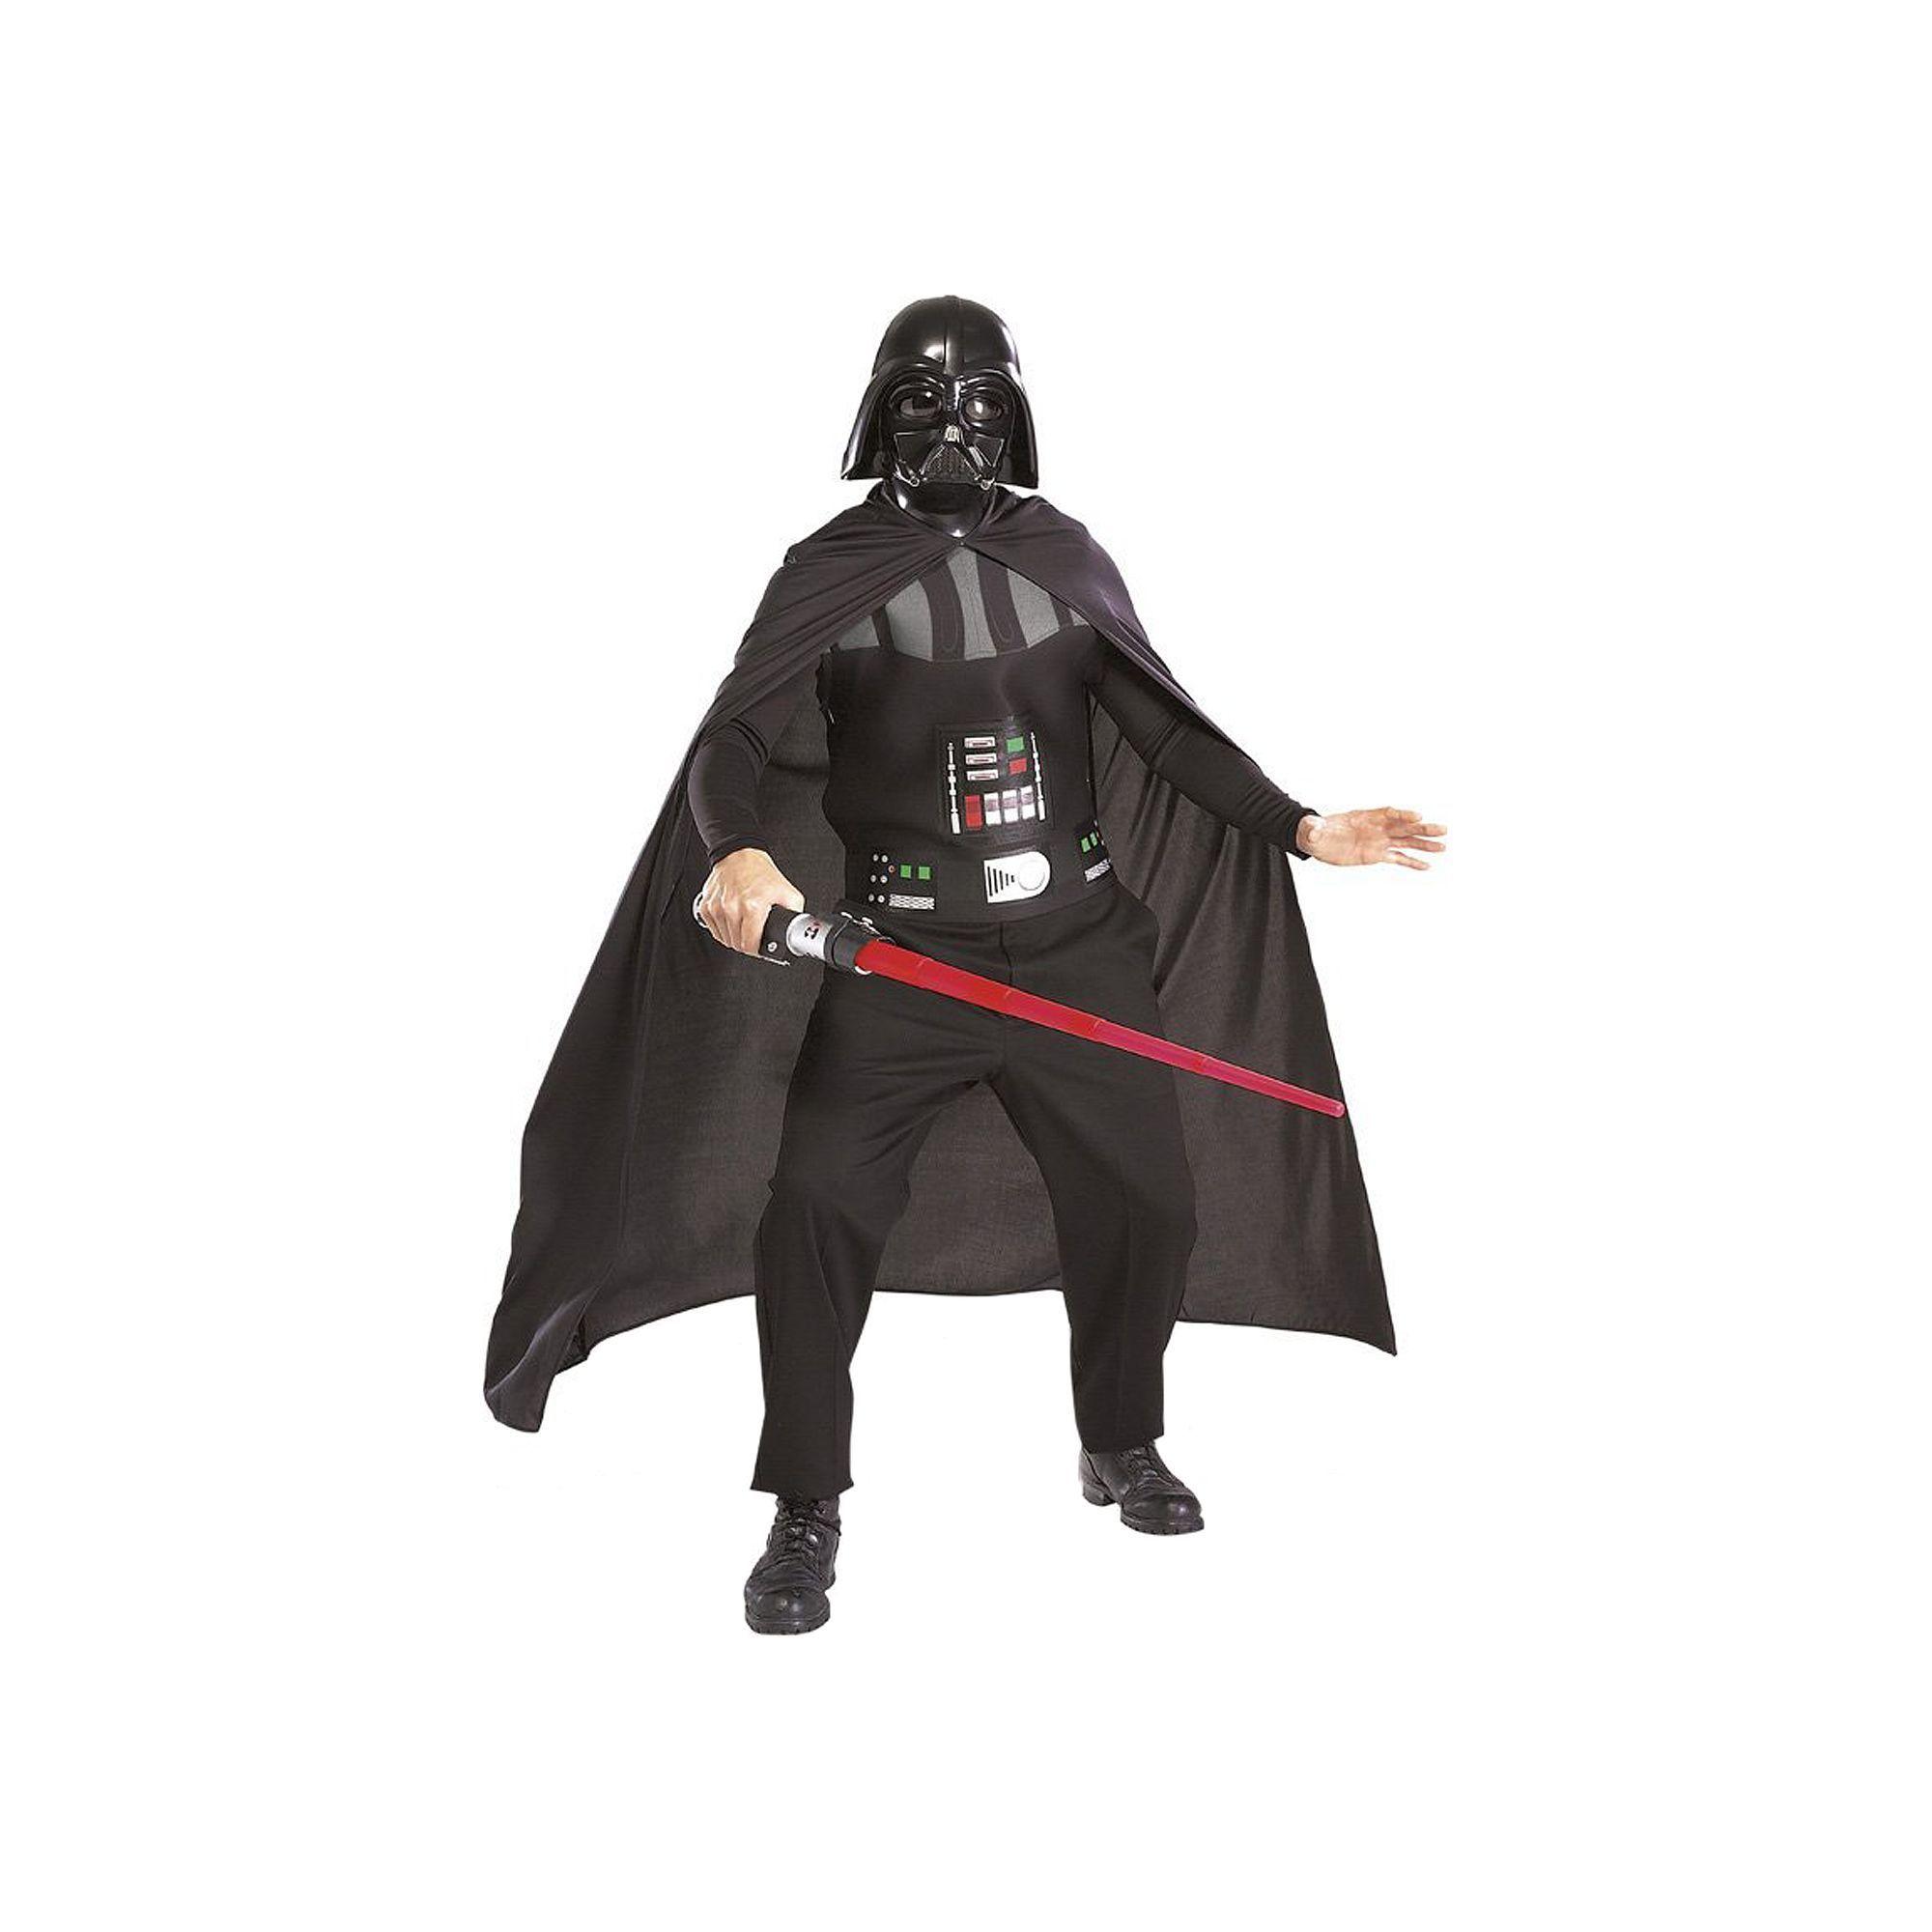 Darth Vader Costume - Adult Menu0027s ...  sc 1 st  Pinterest & Darth Vader Costume - Adult Menu0027s Black | Darth vader costume ...